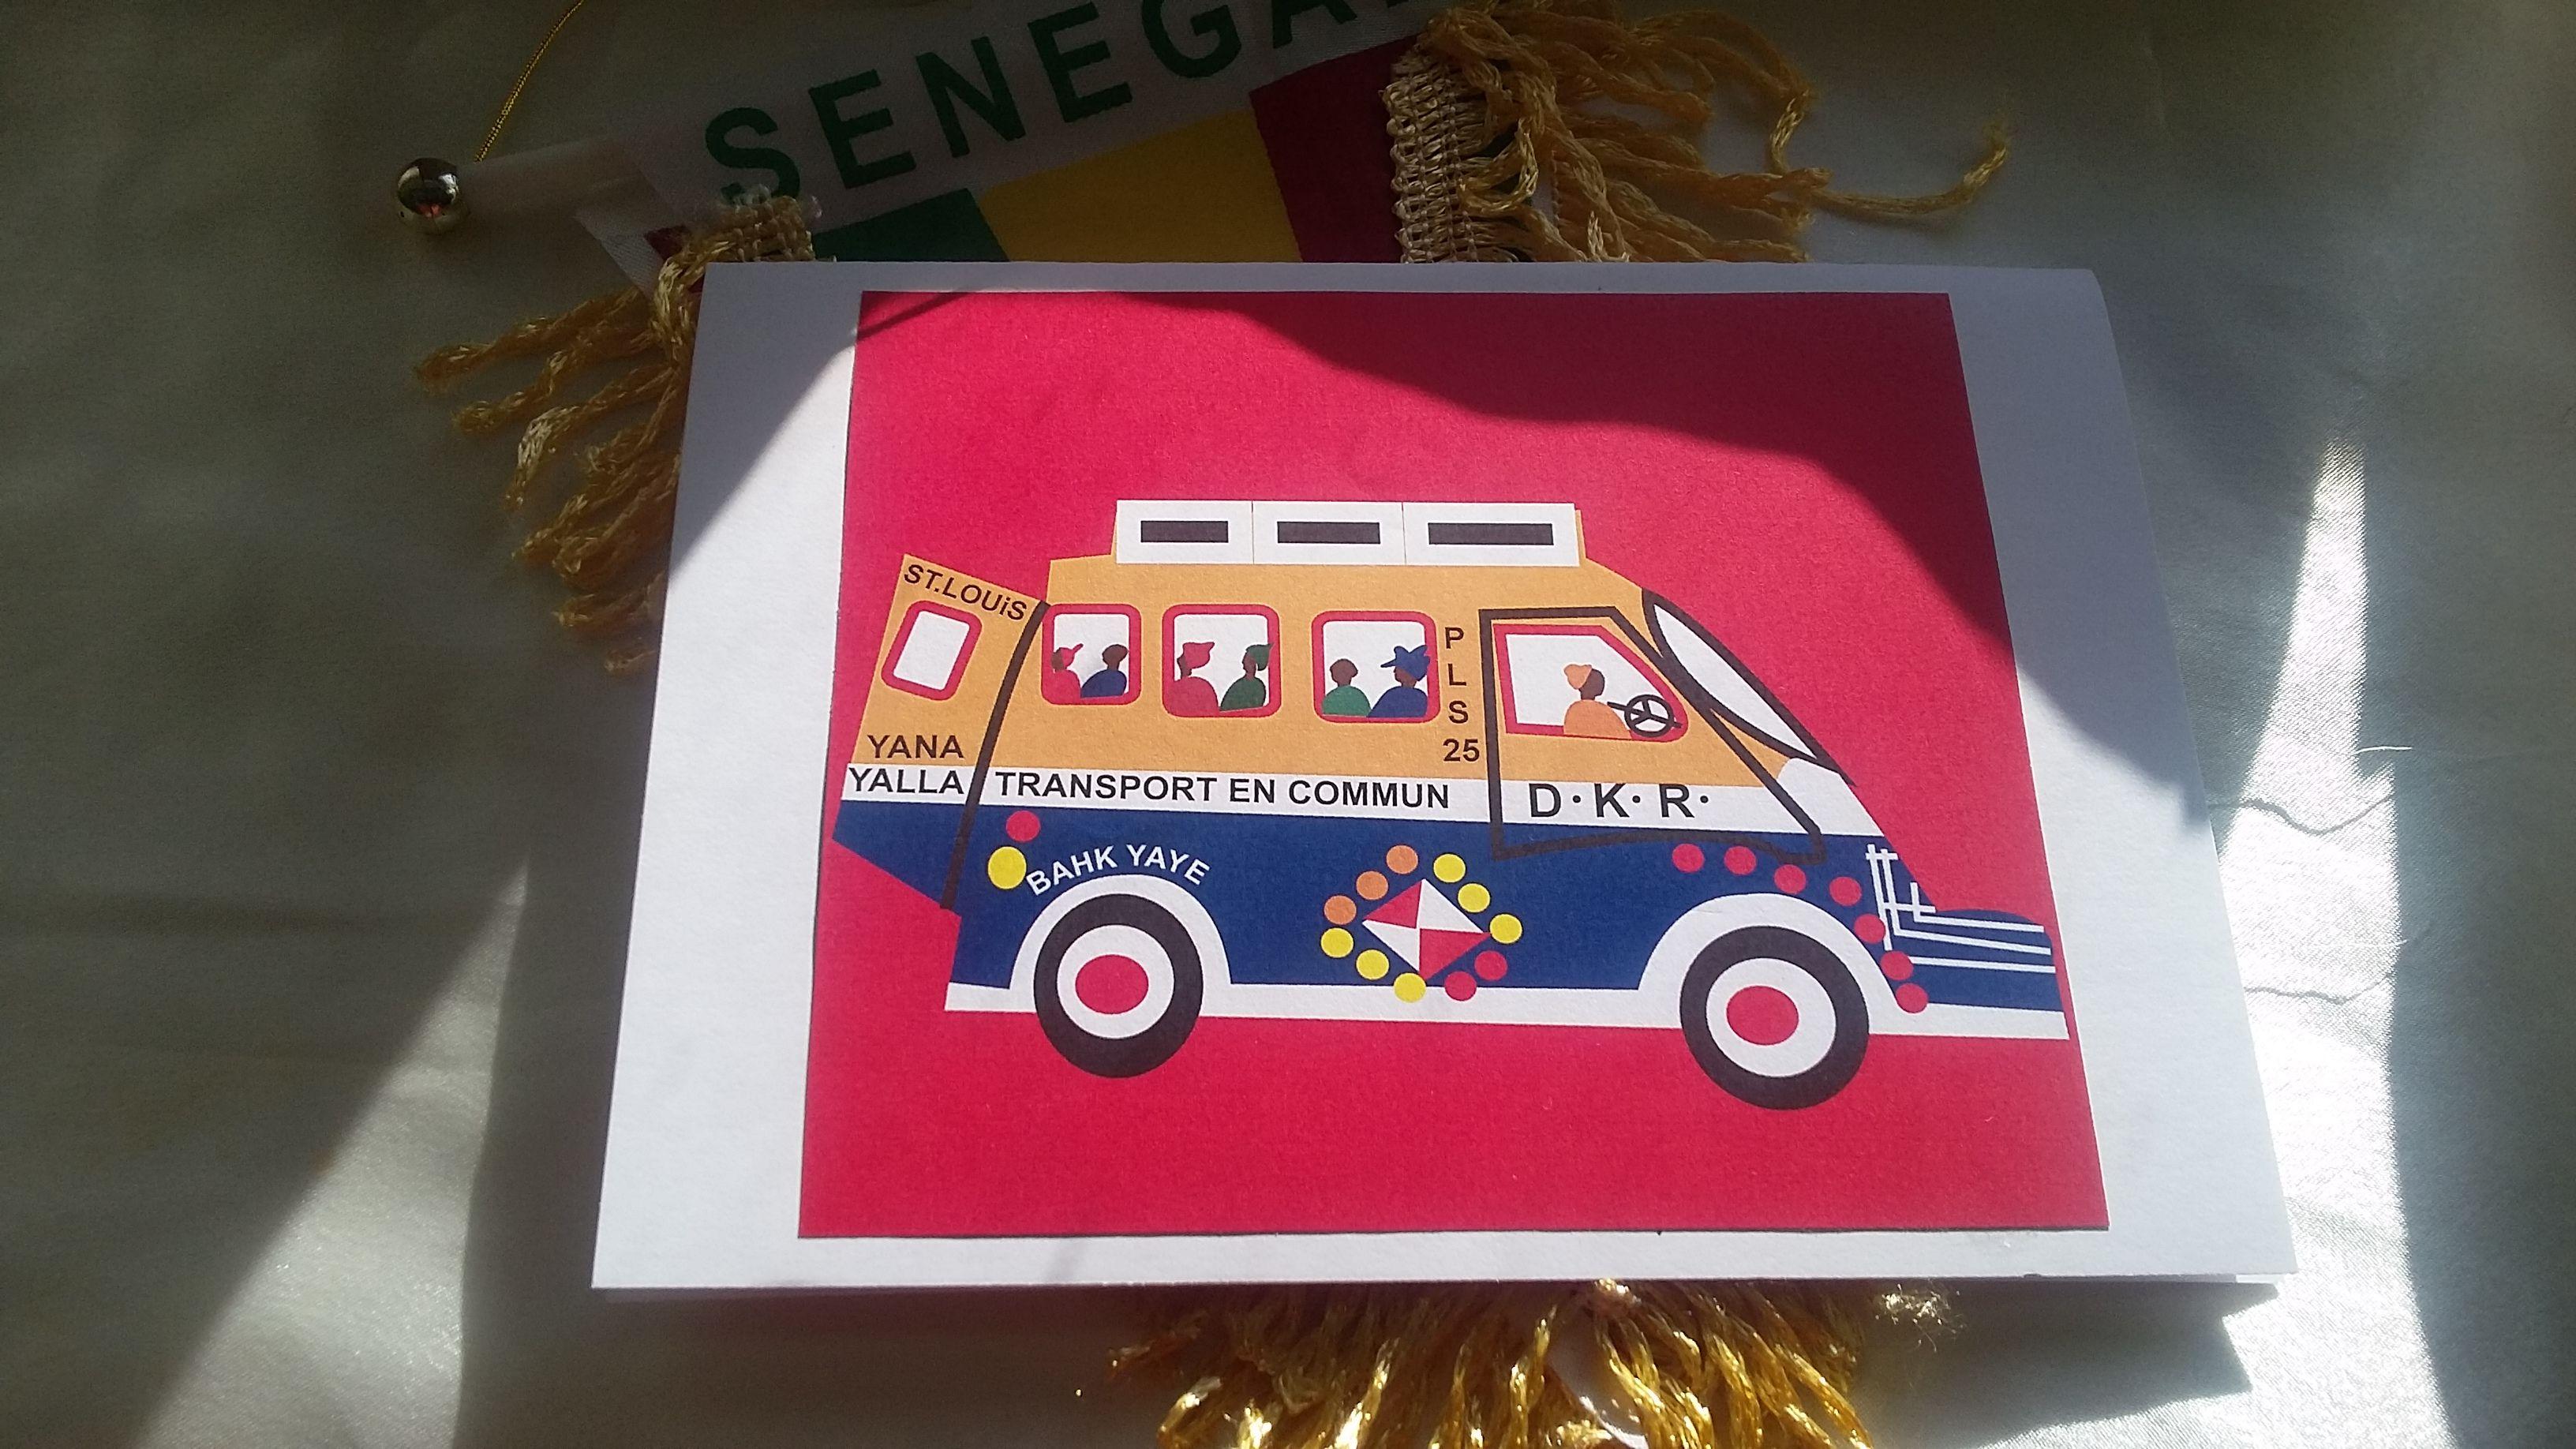 Dakar senegal blank greeting card kdboutik pinterest by khuluwddesignsboutik dakar senegal blank greeting card m4hsunfo